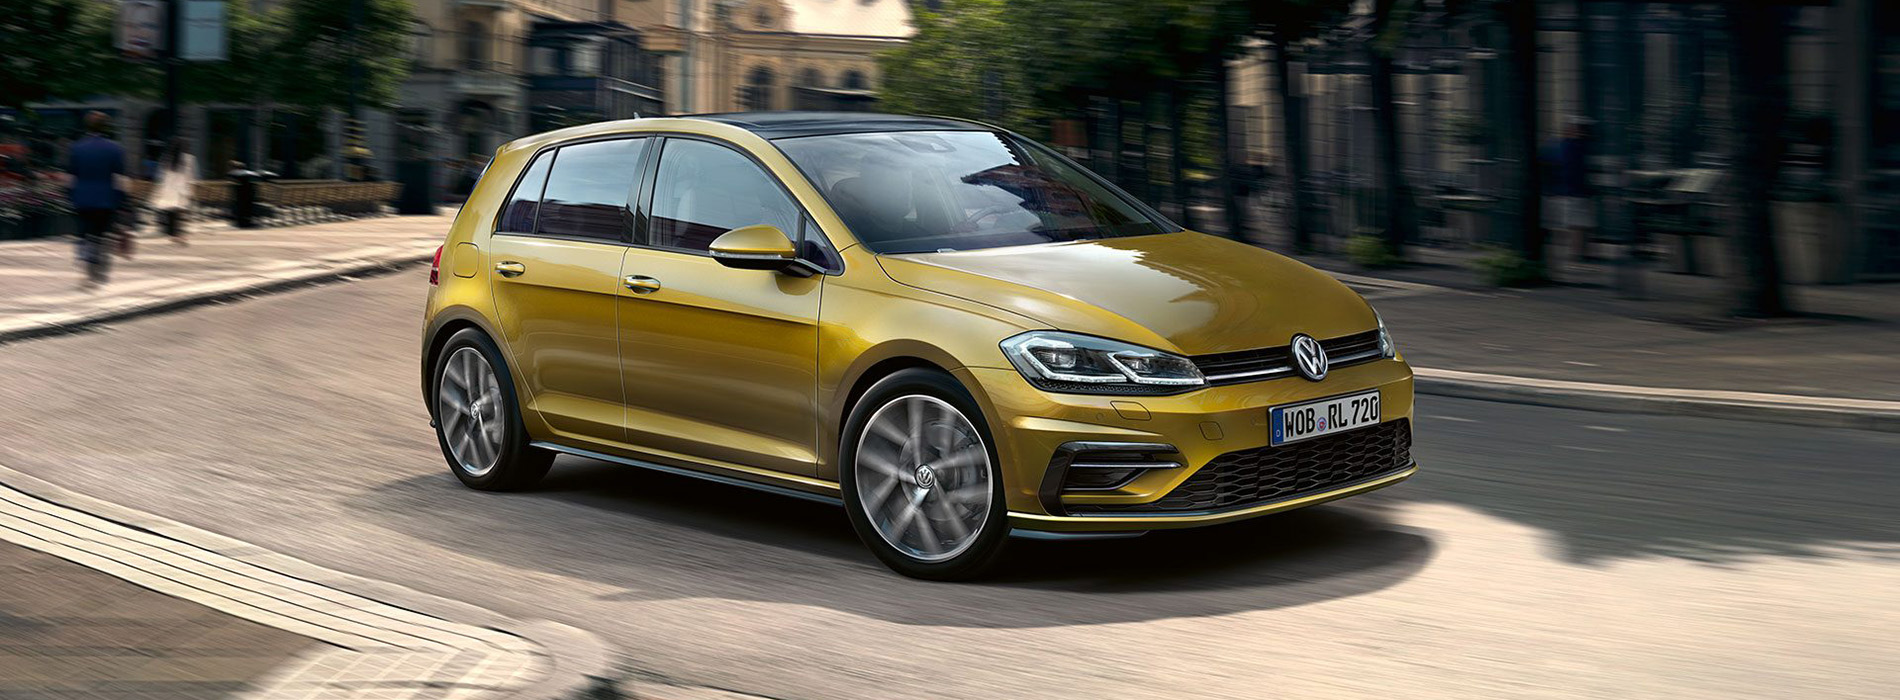 Noleggio Lungo Termine Volkswagen Golf 17 14 Tgi Business